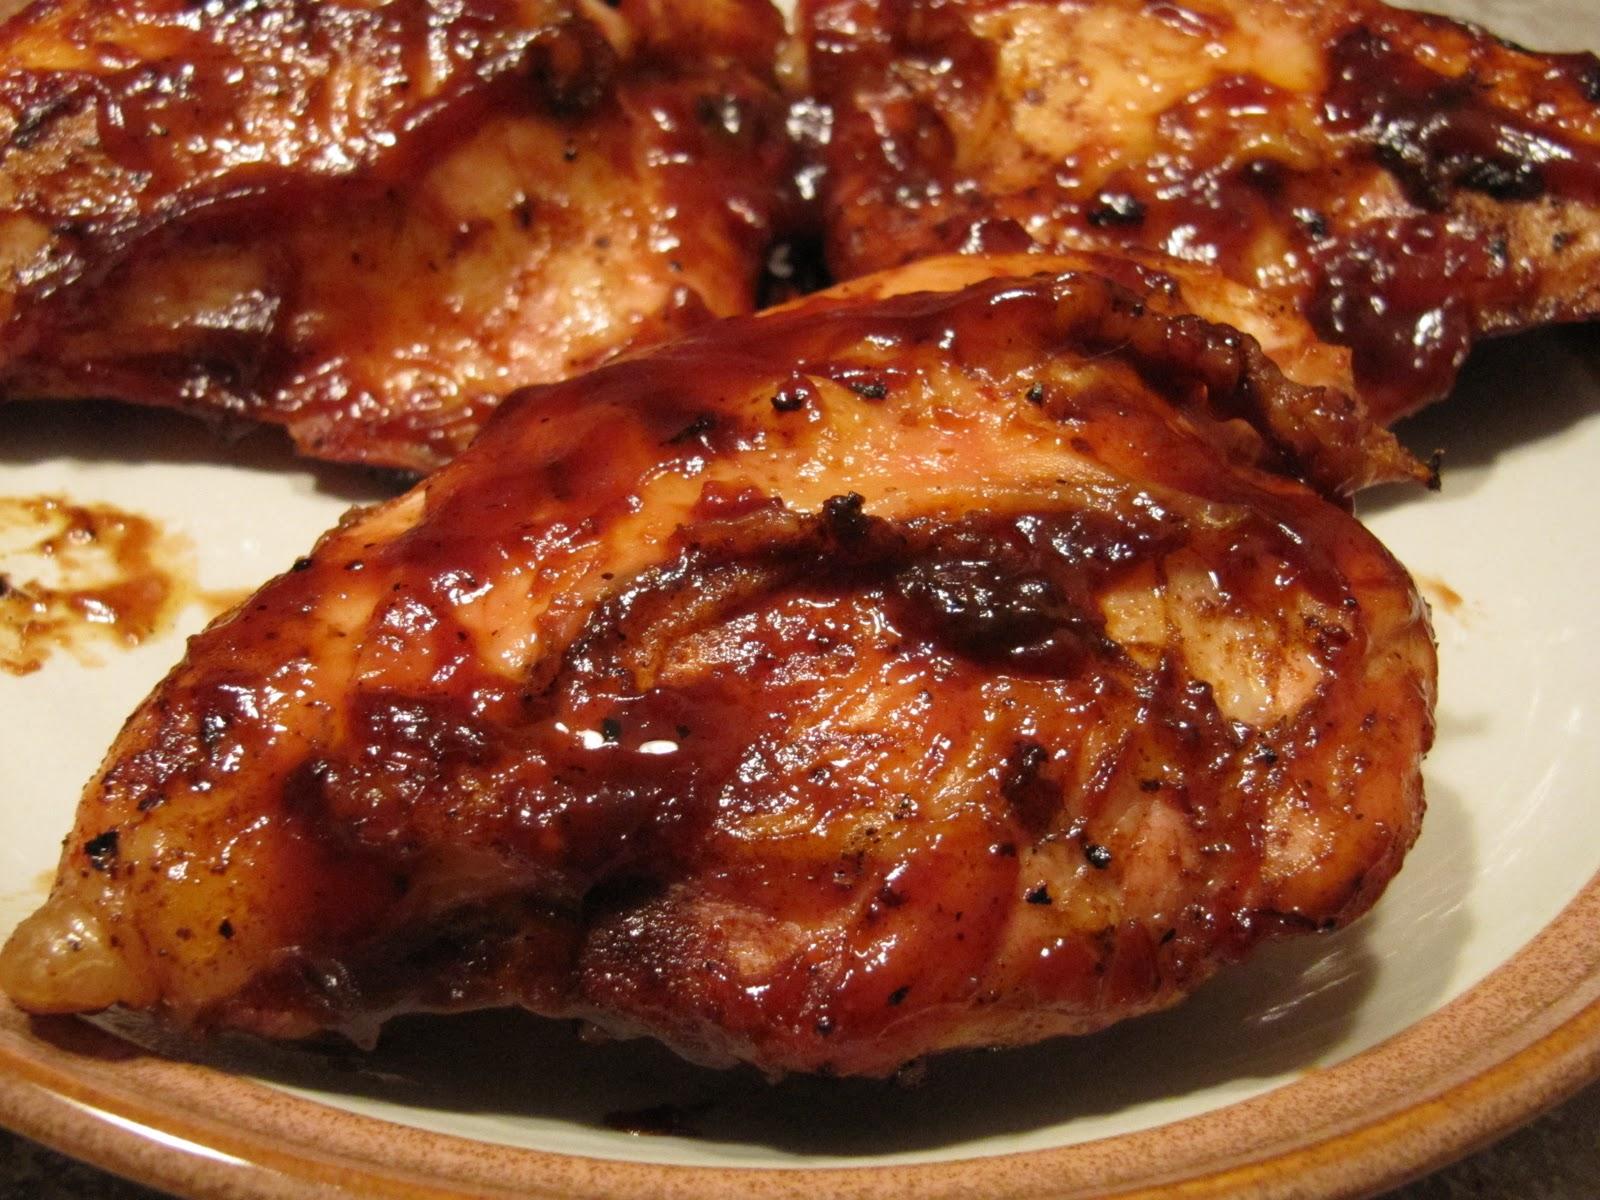 Boneless breast bbq chicken